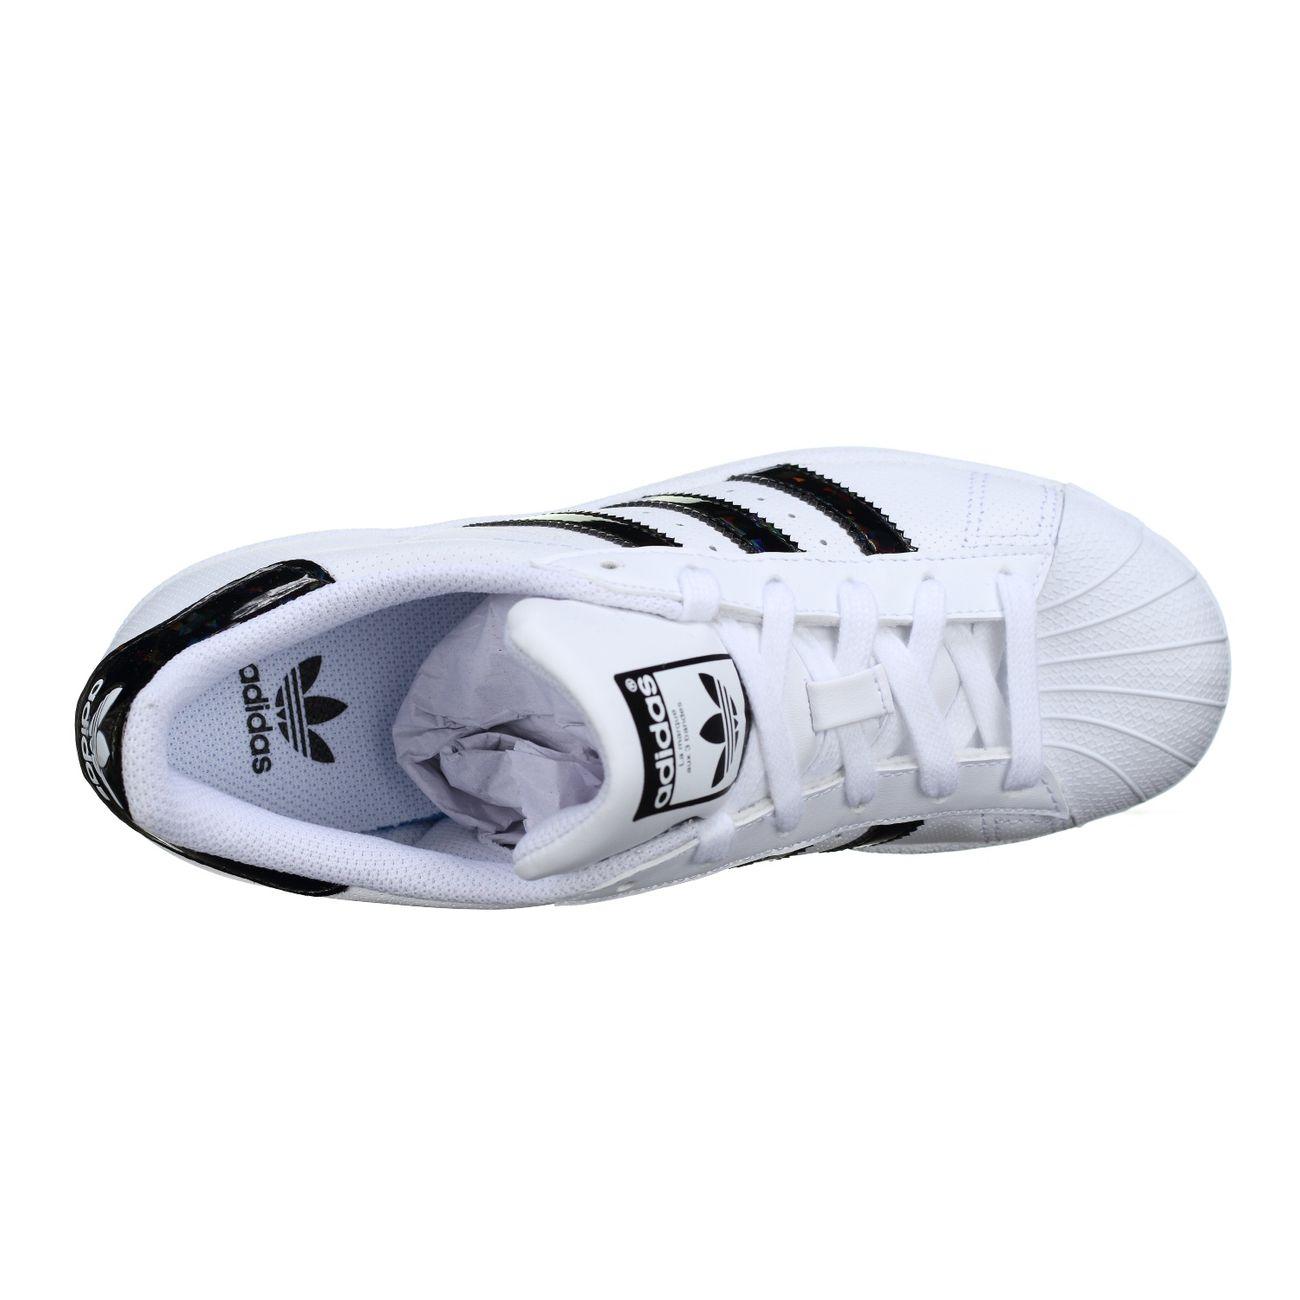 ... Mode- Lifestyle homme ADIDAS Basket Adidas Superstar J Db1209 Blanc / Noir ...